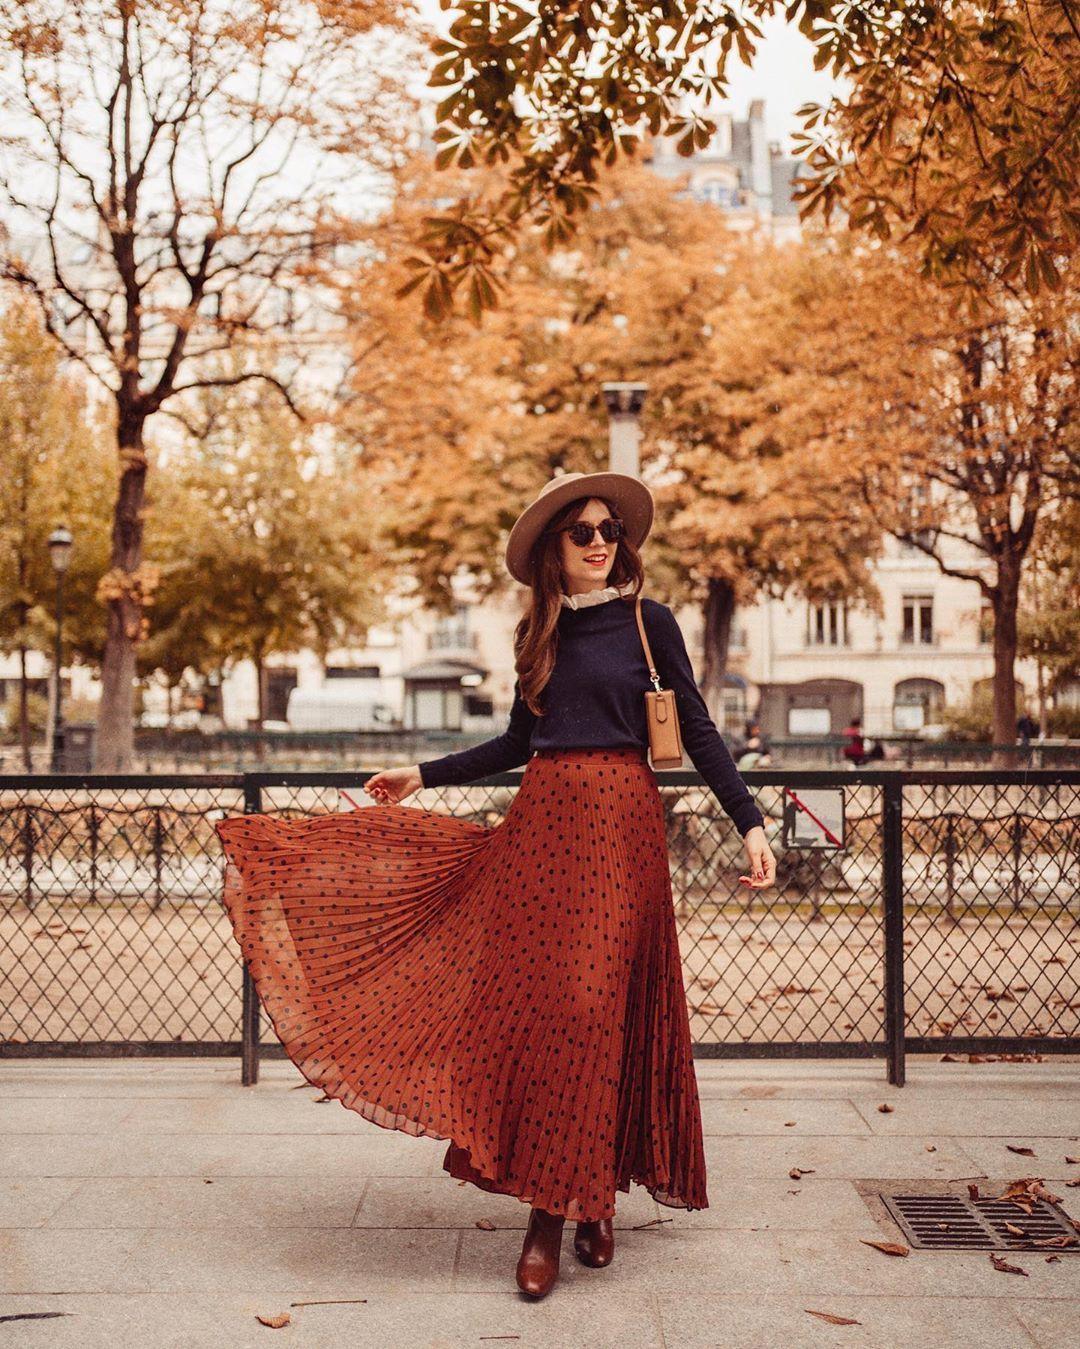 Autumn everywhere. The pleated skirt plumes like a peacock